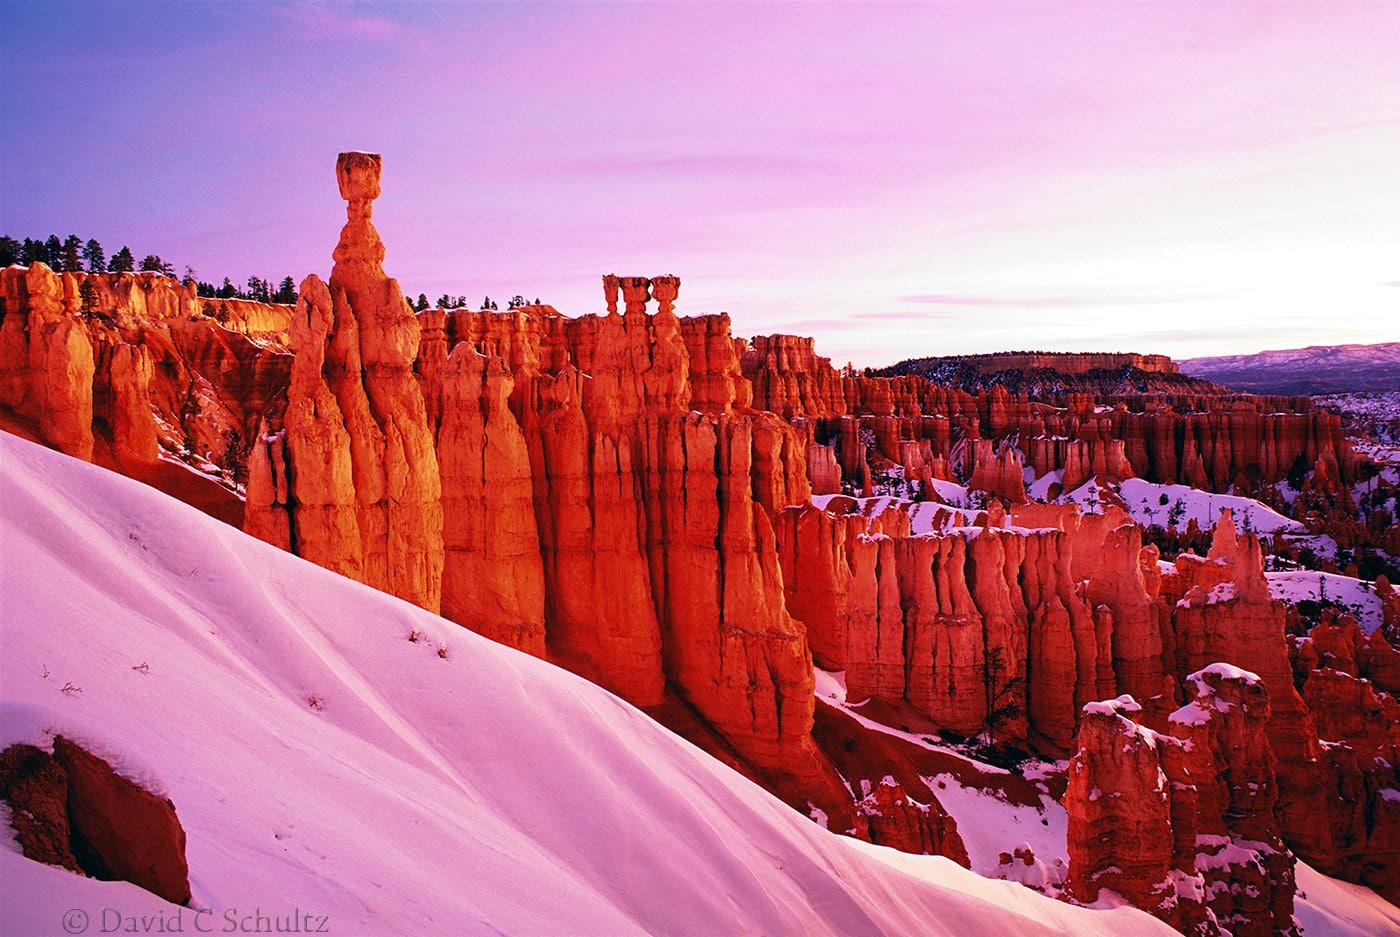 Winter in Bryce National Park, Utah - Image #15-453